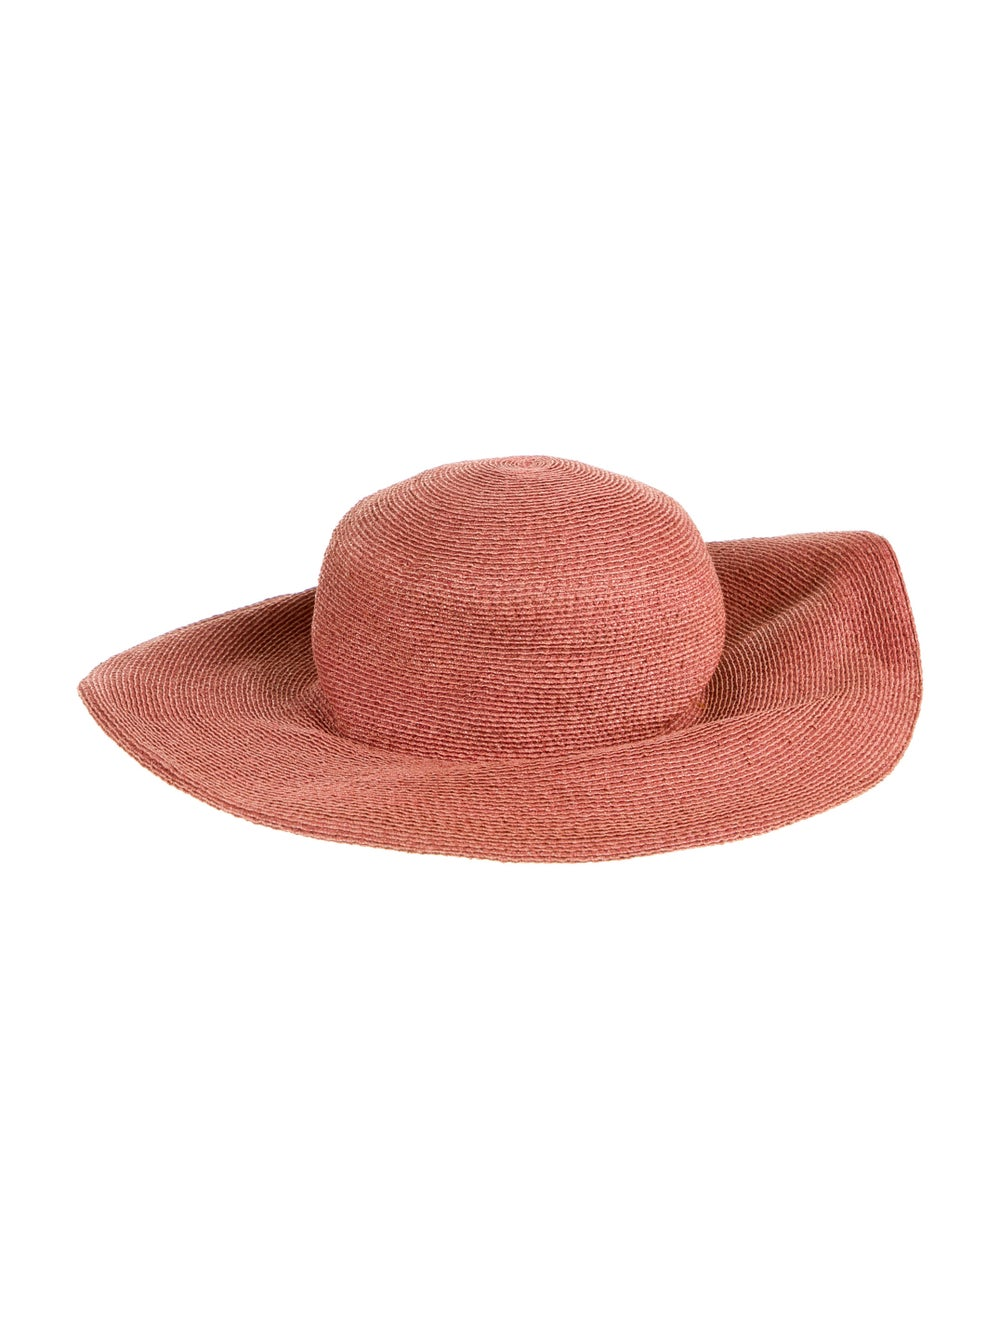 Patricia Underwood Raffia Wide-Brim Hat red - image 2